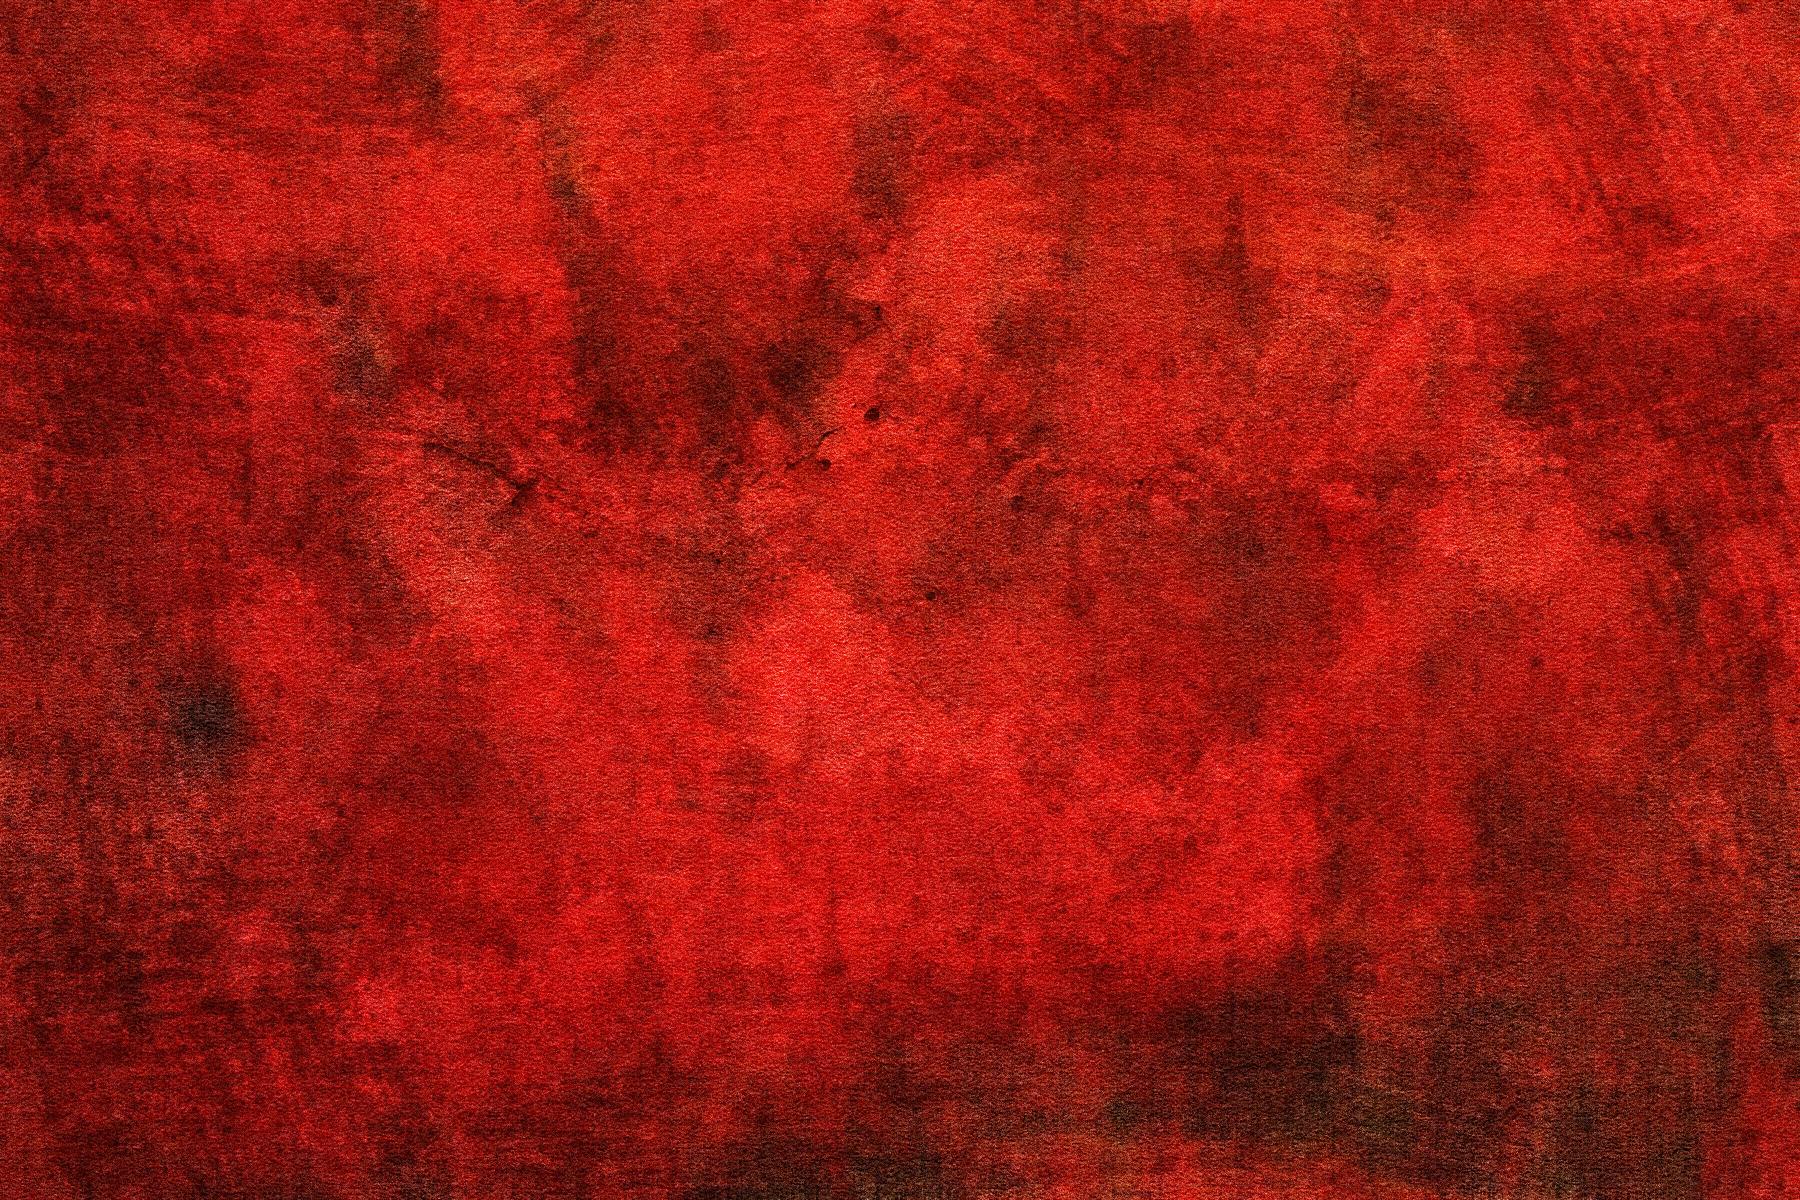 Red Texture Textures Geprek Wallpaper 1800x1200 Full HD Wallpapers 1800x1200